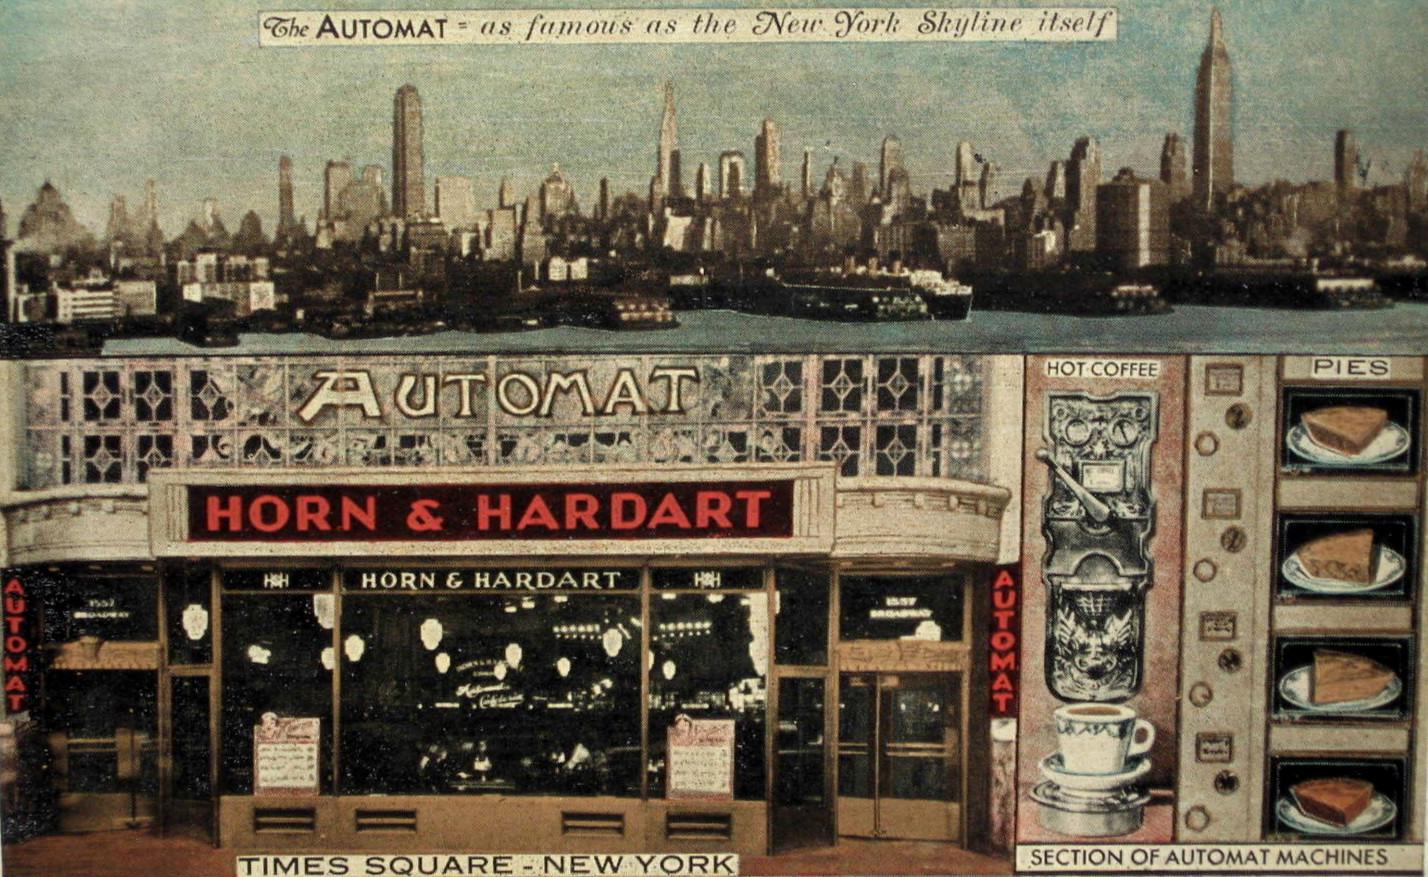 Horn_&_Hardart_Times_Square_New_York_circa_1939